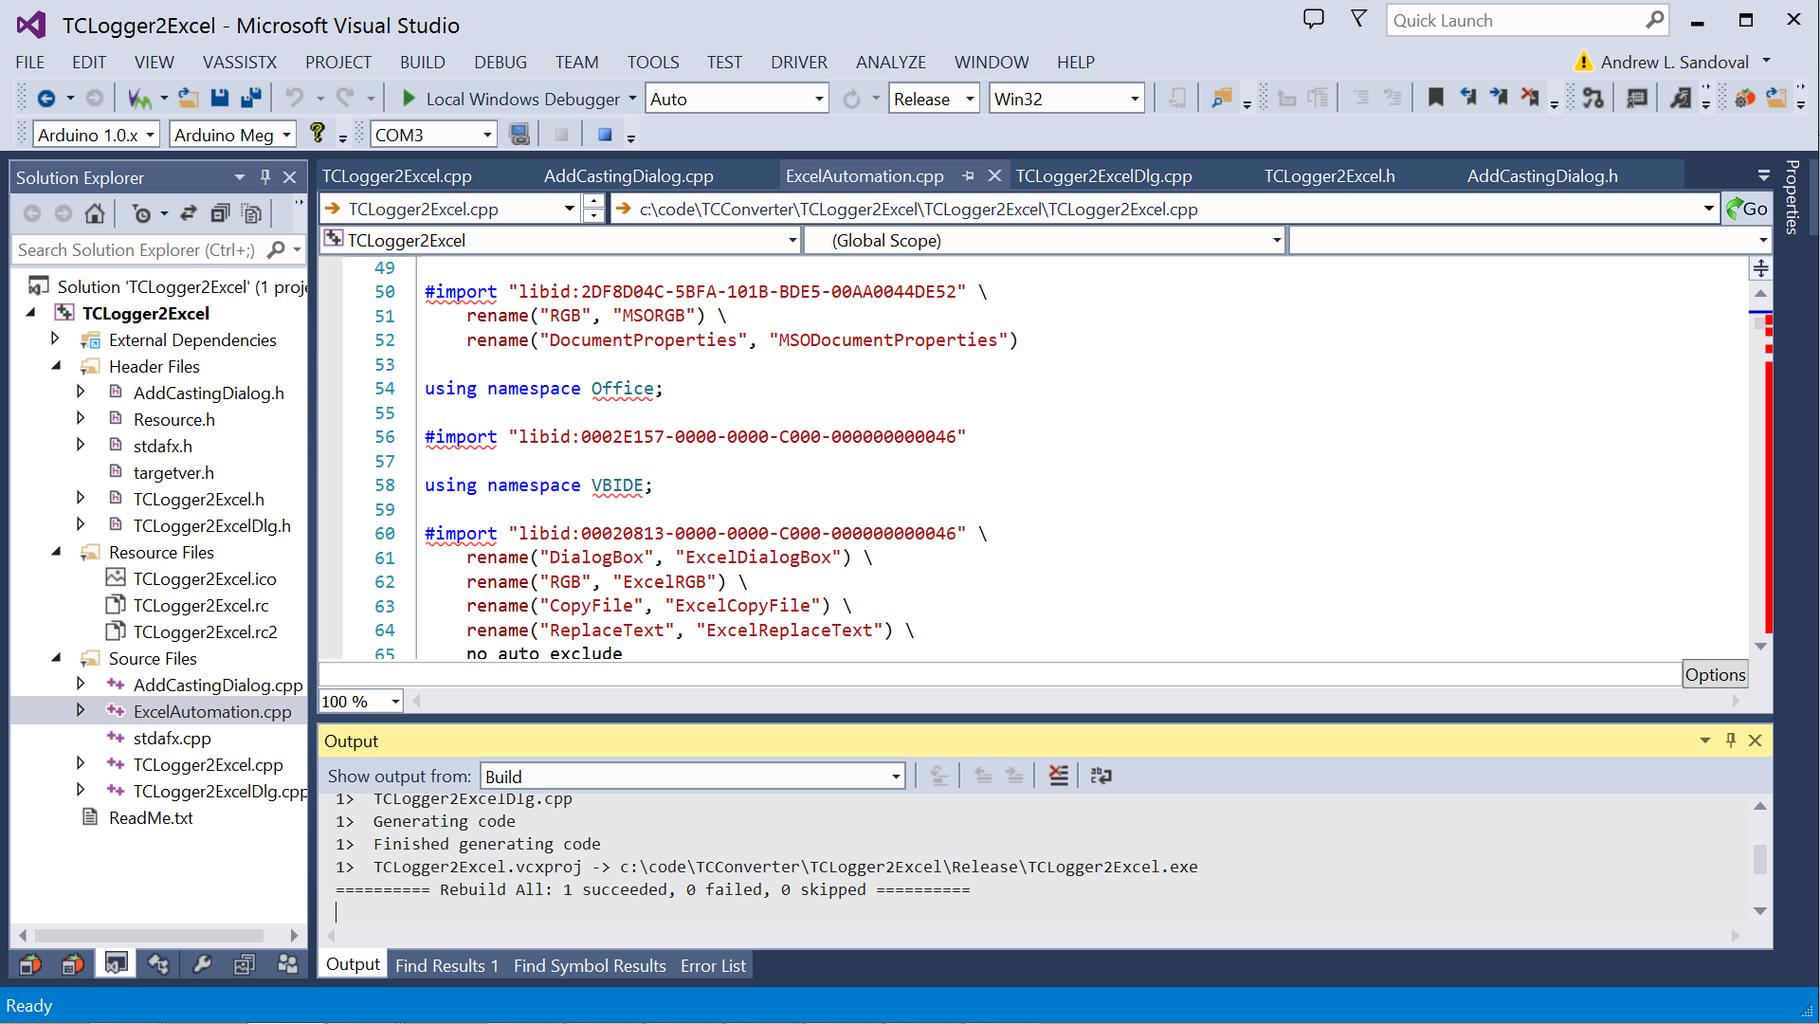 Building TCLogger2Excel in Microsoft Visual Studio 2013...